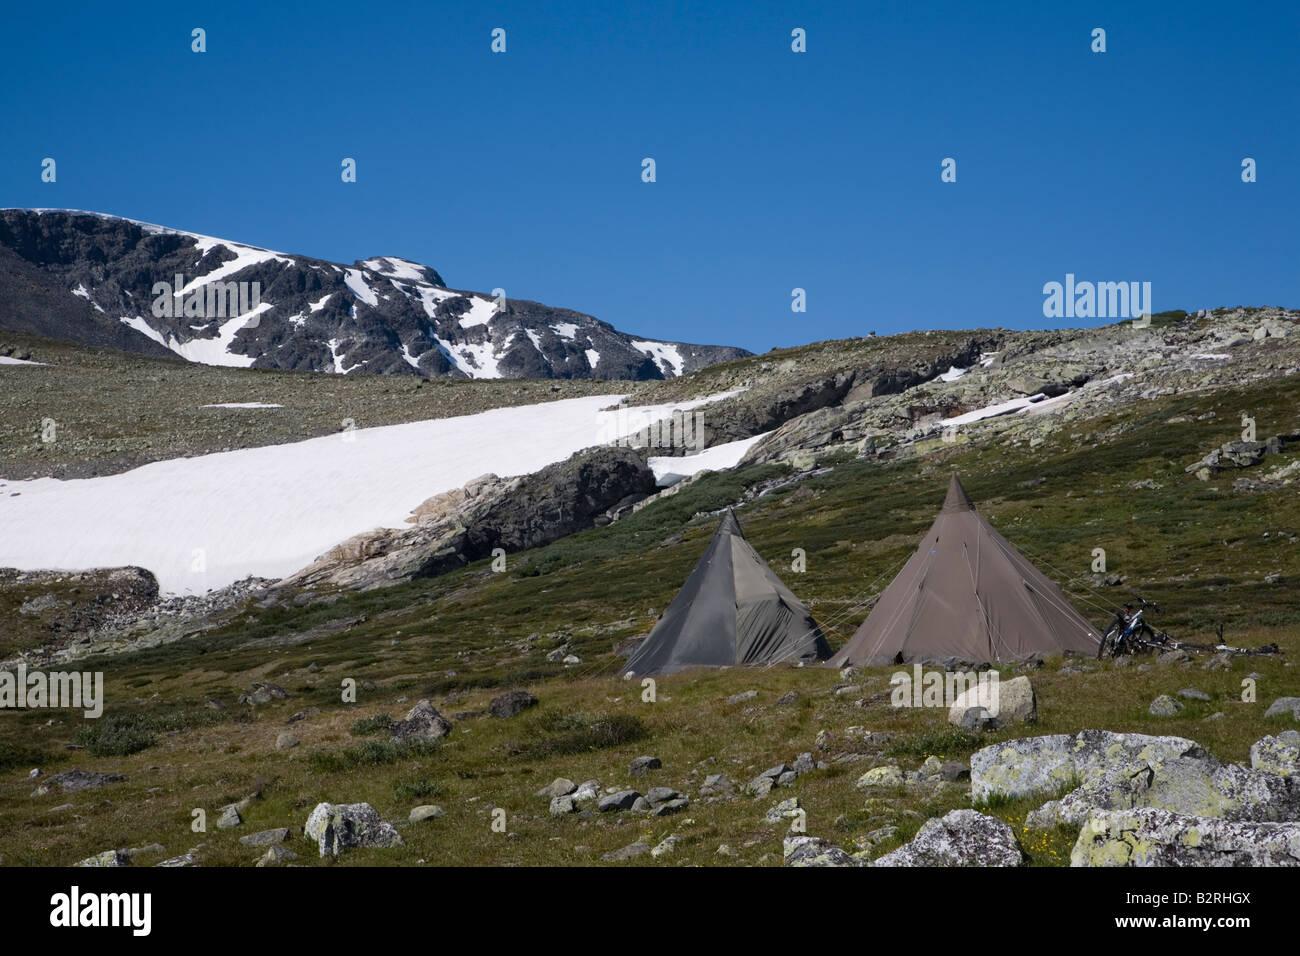 Norway Glittertind Laplander s tents summer 2008 - Stock Image